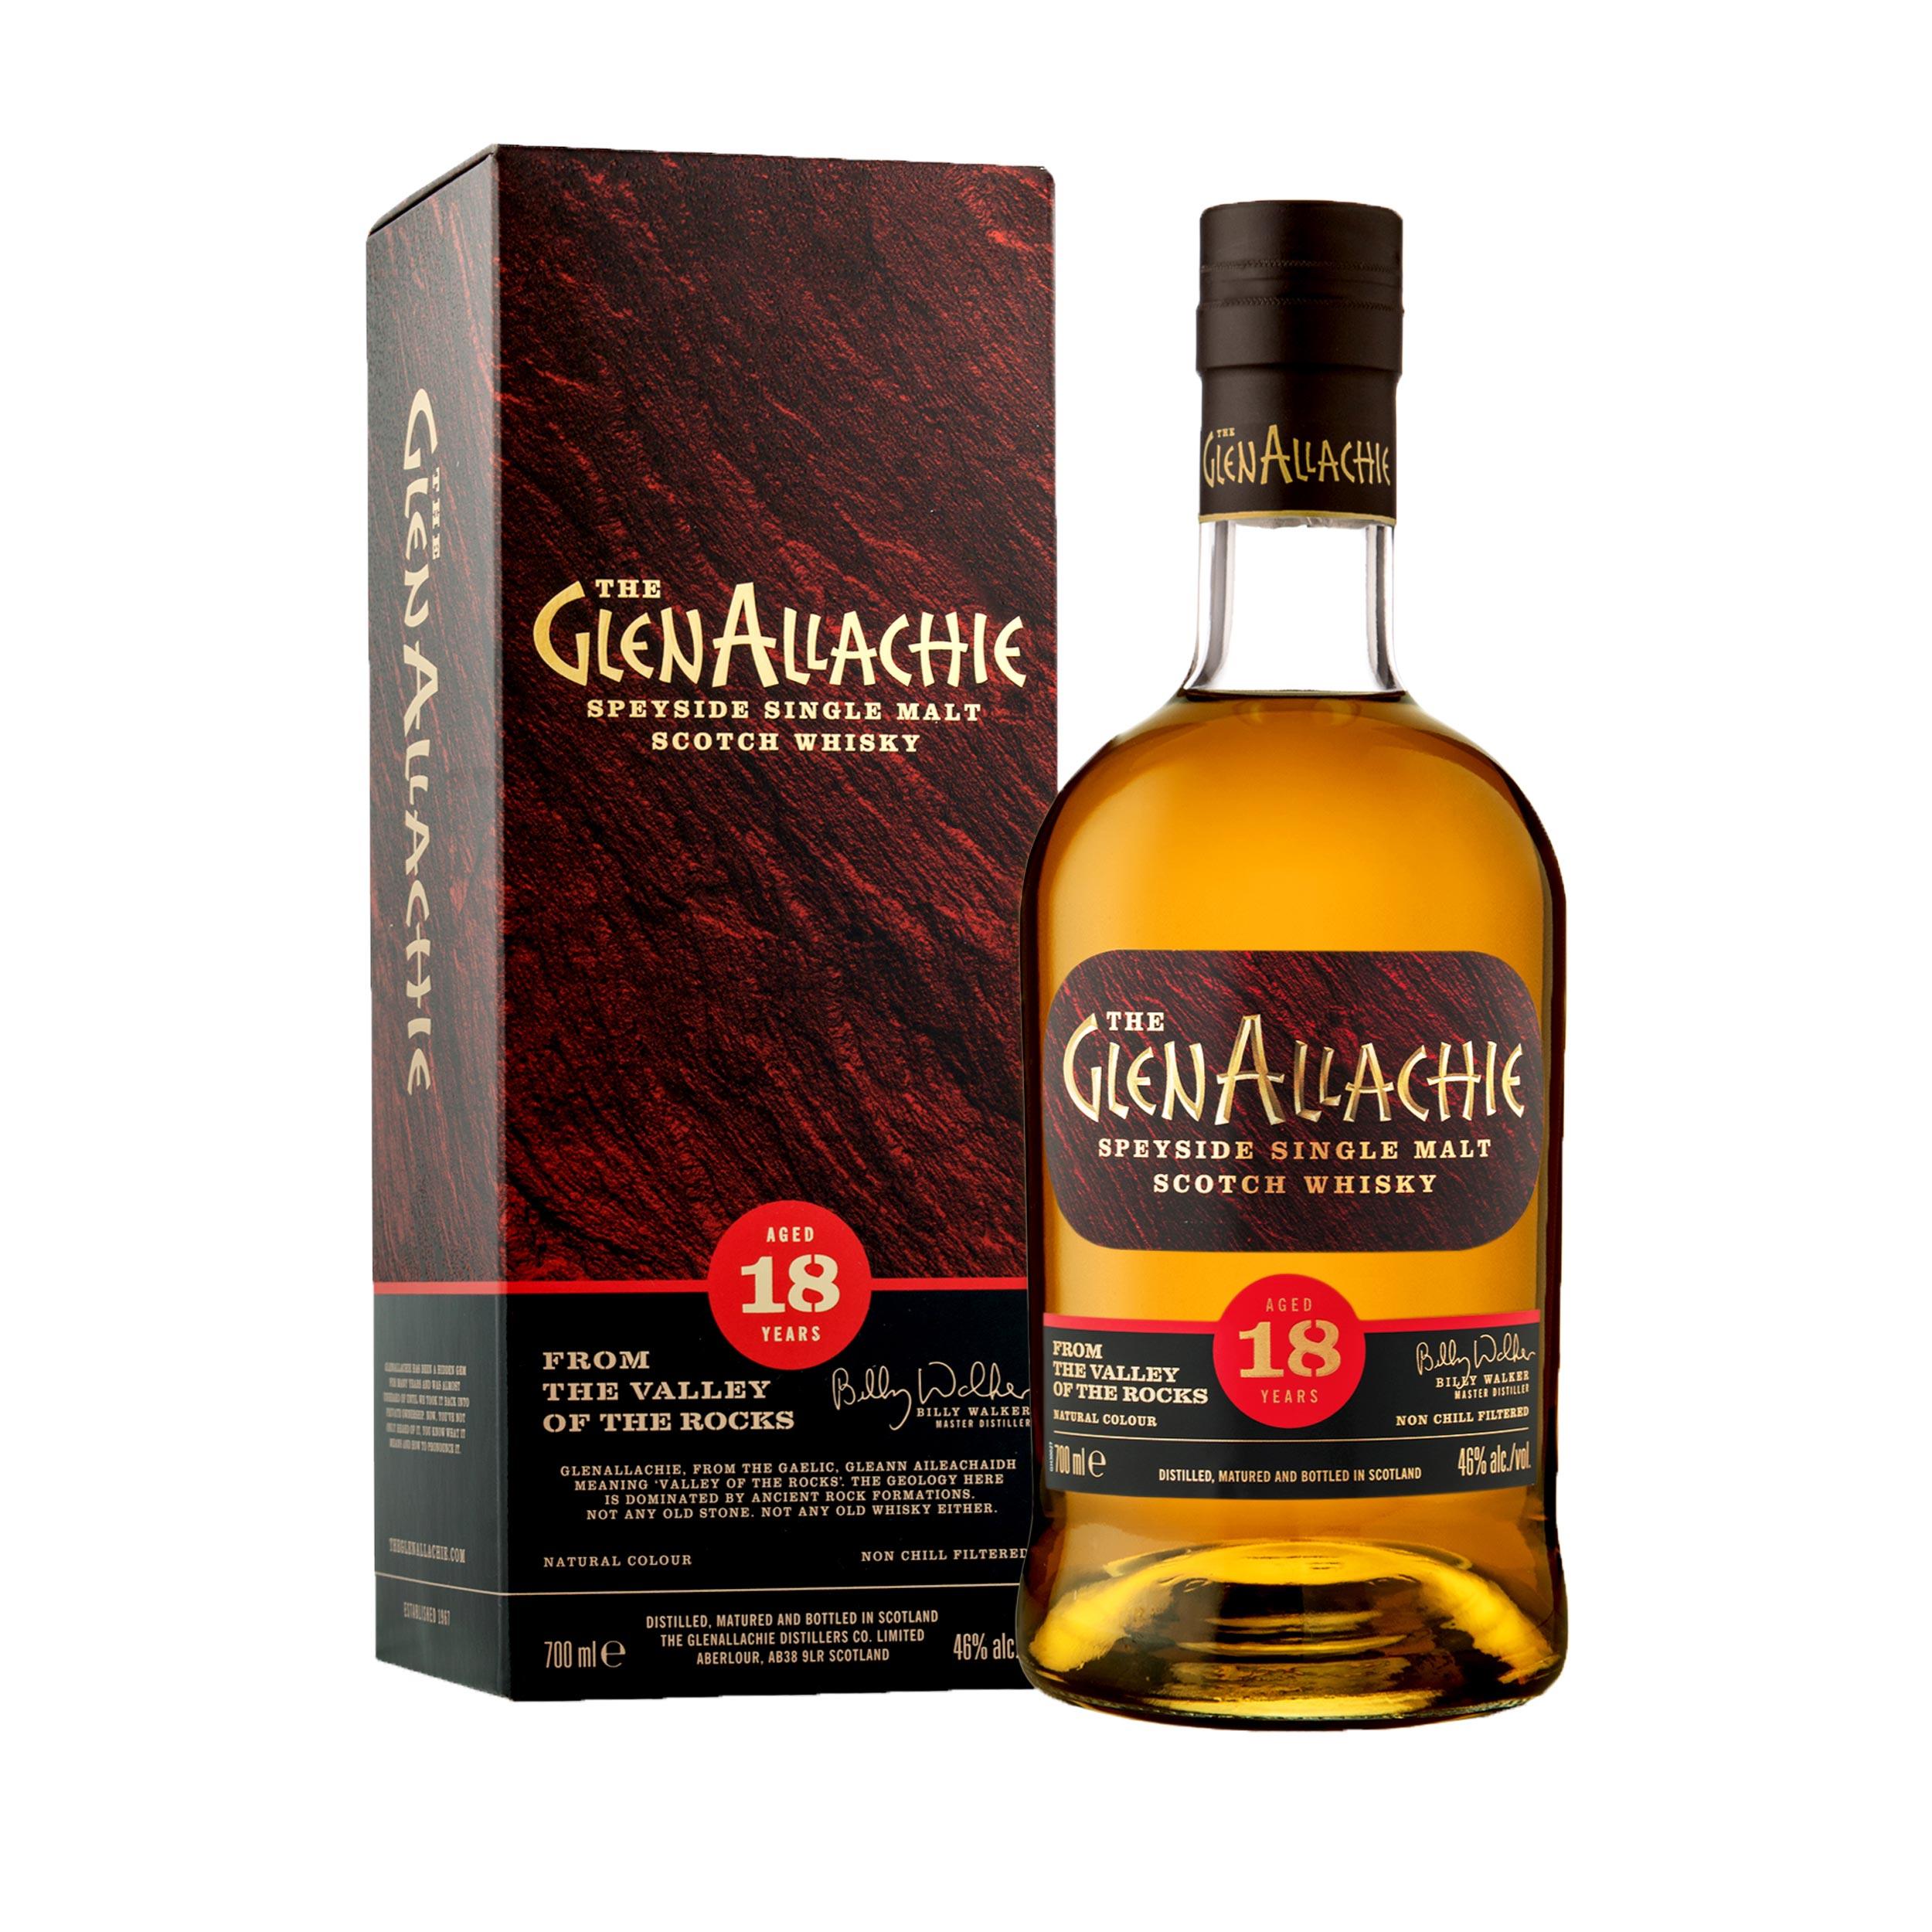 GlenAllachie 18 Year Old Speyside Single Malt Scotch Whisky 70cl